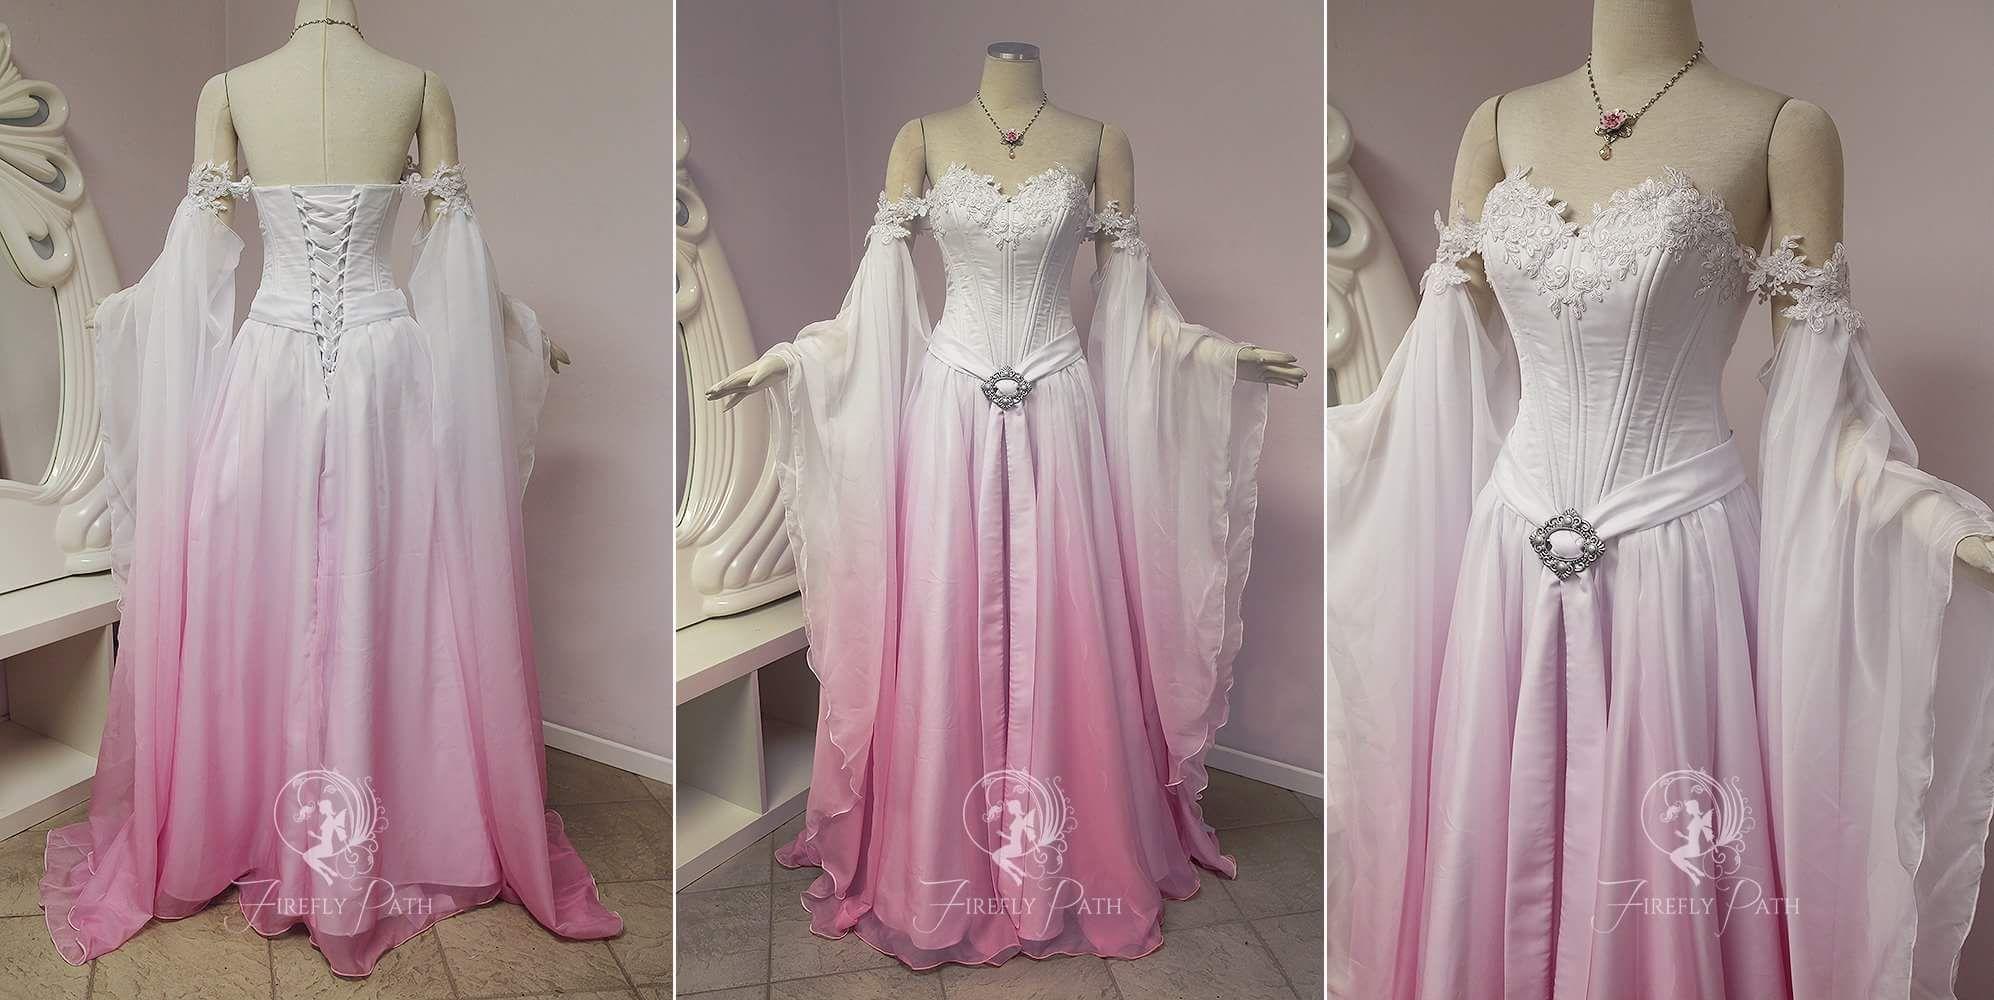 Sakura By Firefly Path Wish List Fairytale Dress